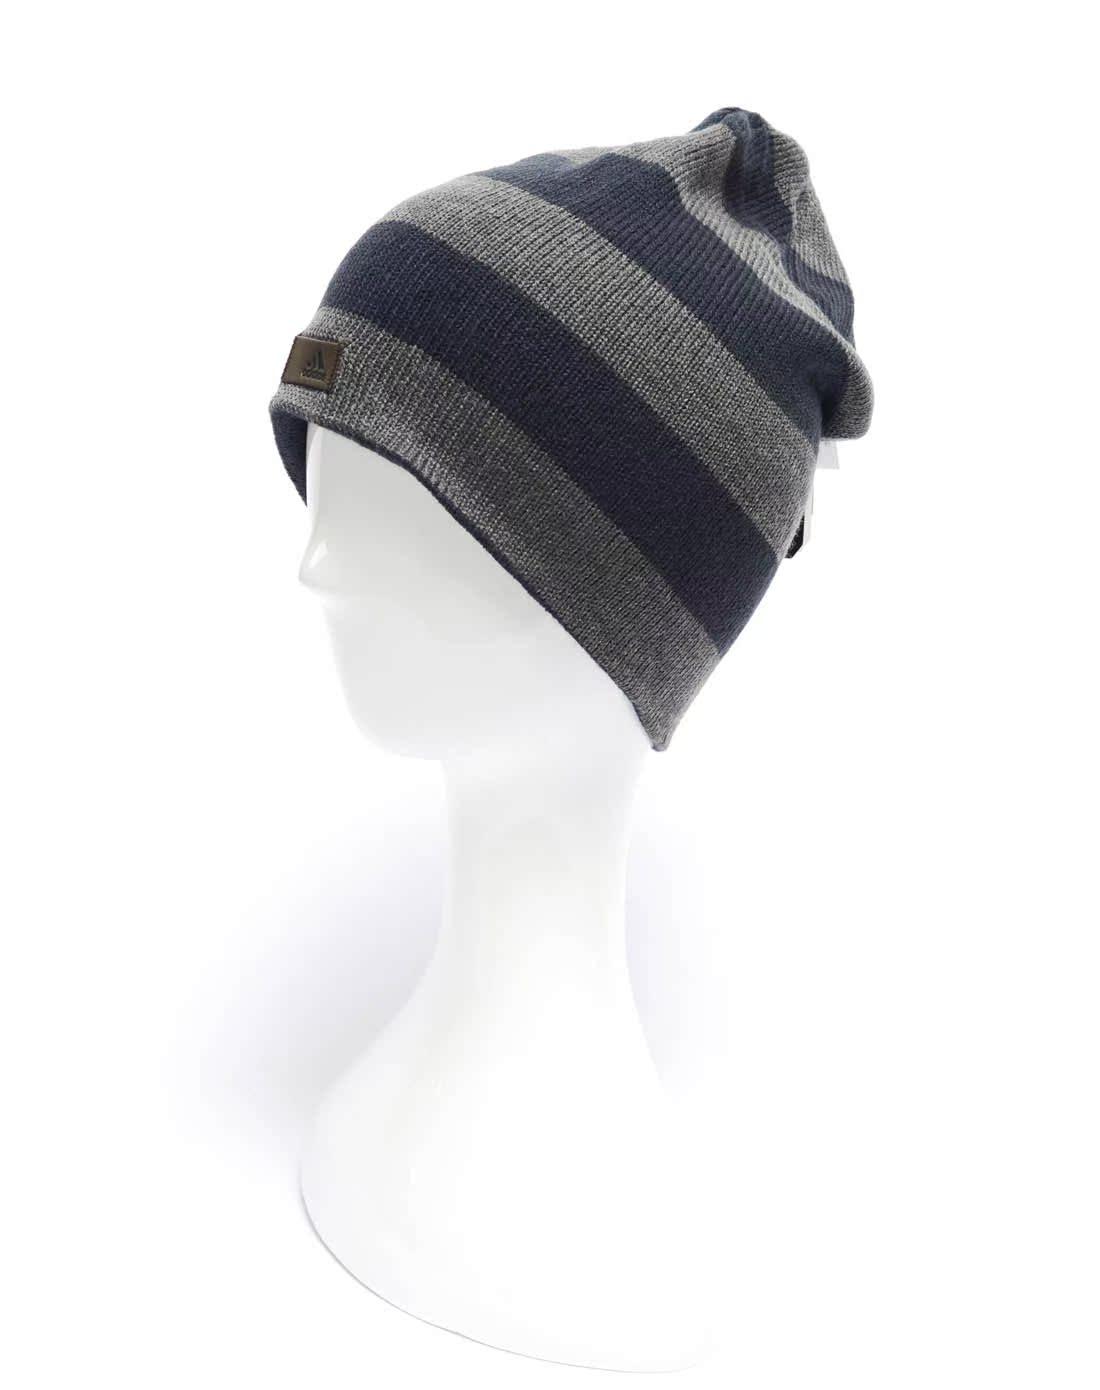 Шапки и кепки для туризма и кемпинга Adidas p93976